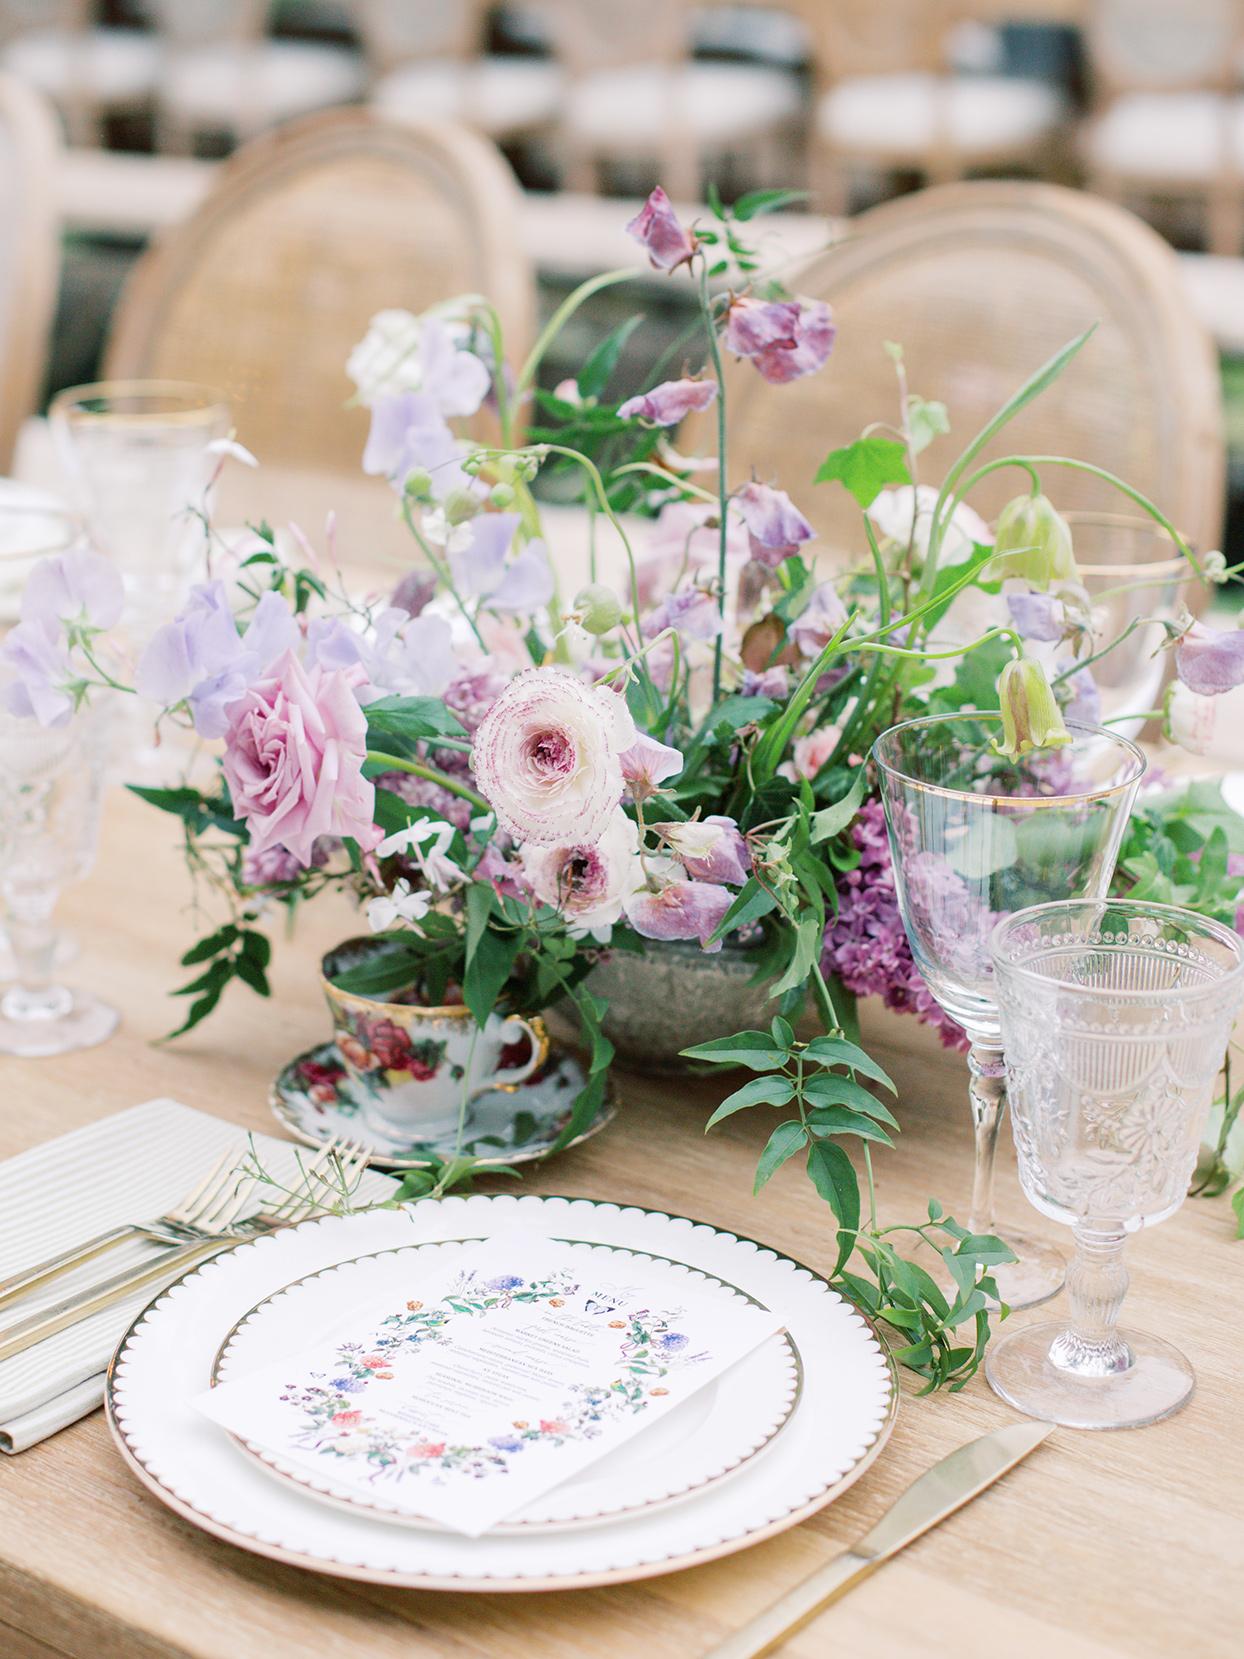 raina salih wedding centerpiece with lavender bouquet